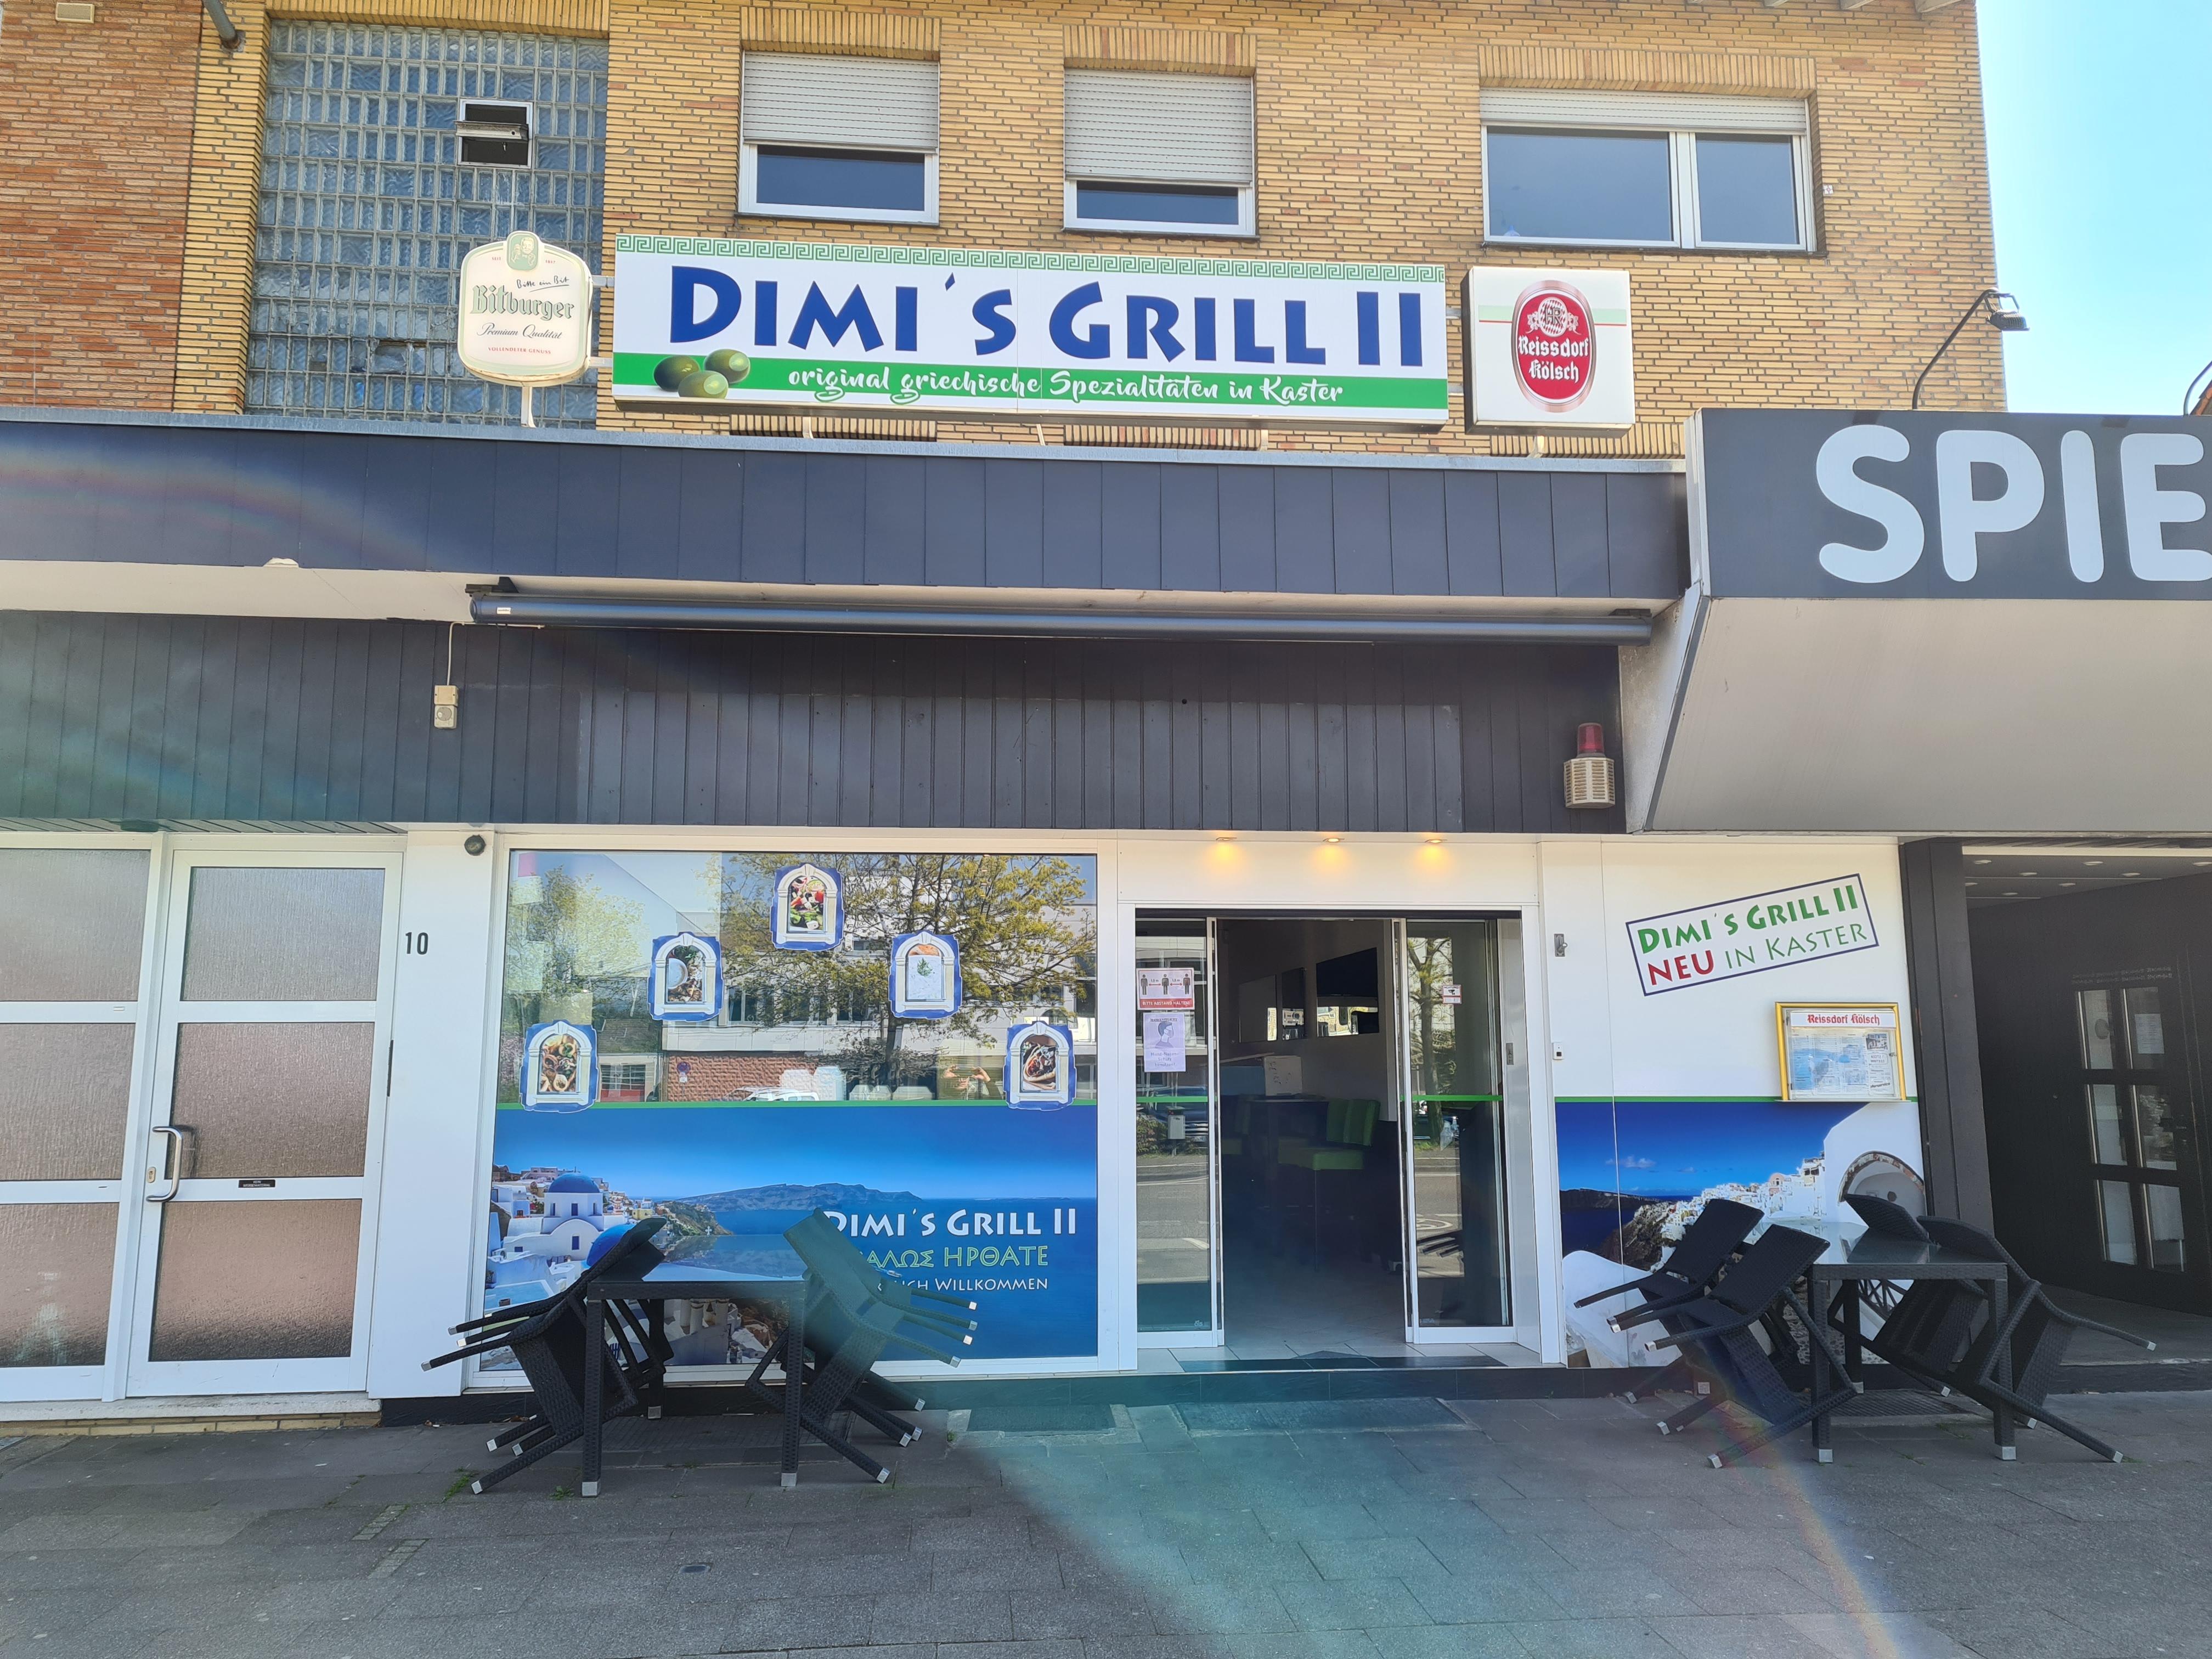 Dimi's Grill